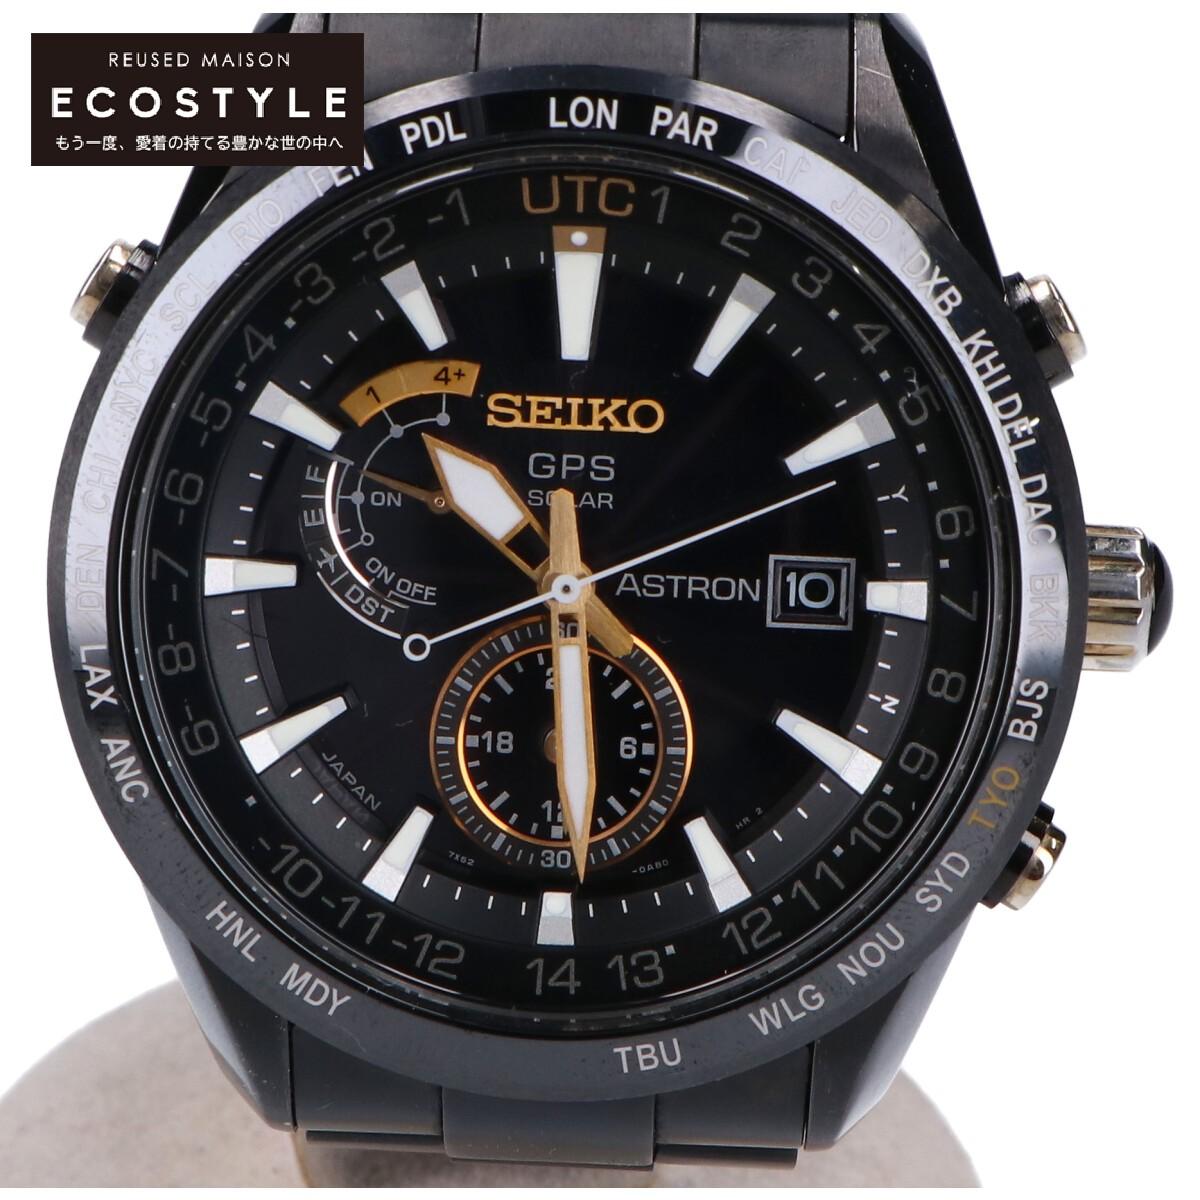 SEIKO セイコー SBXA100 cal.7X52 ASTRON アストロン 100周年記念 服部金太郎特別限定モデル 中古 ブラック メンズ 腕時計 世界限定5 000本 年間定番 即出荷 GPSソーラー電波